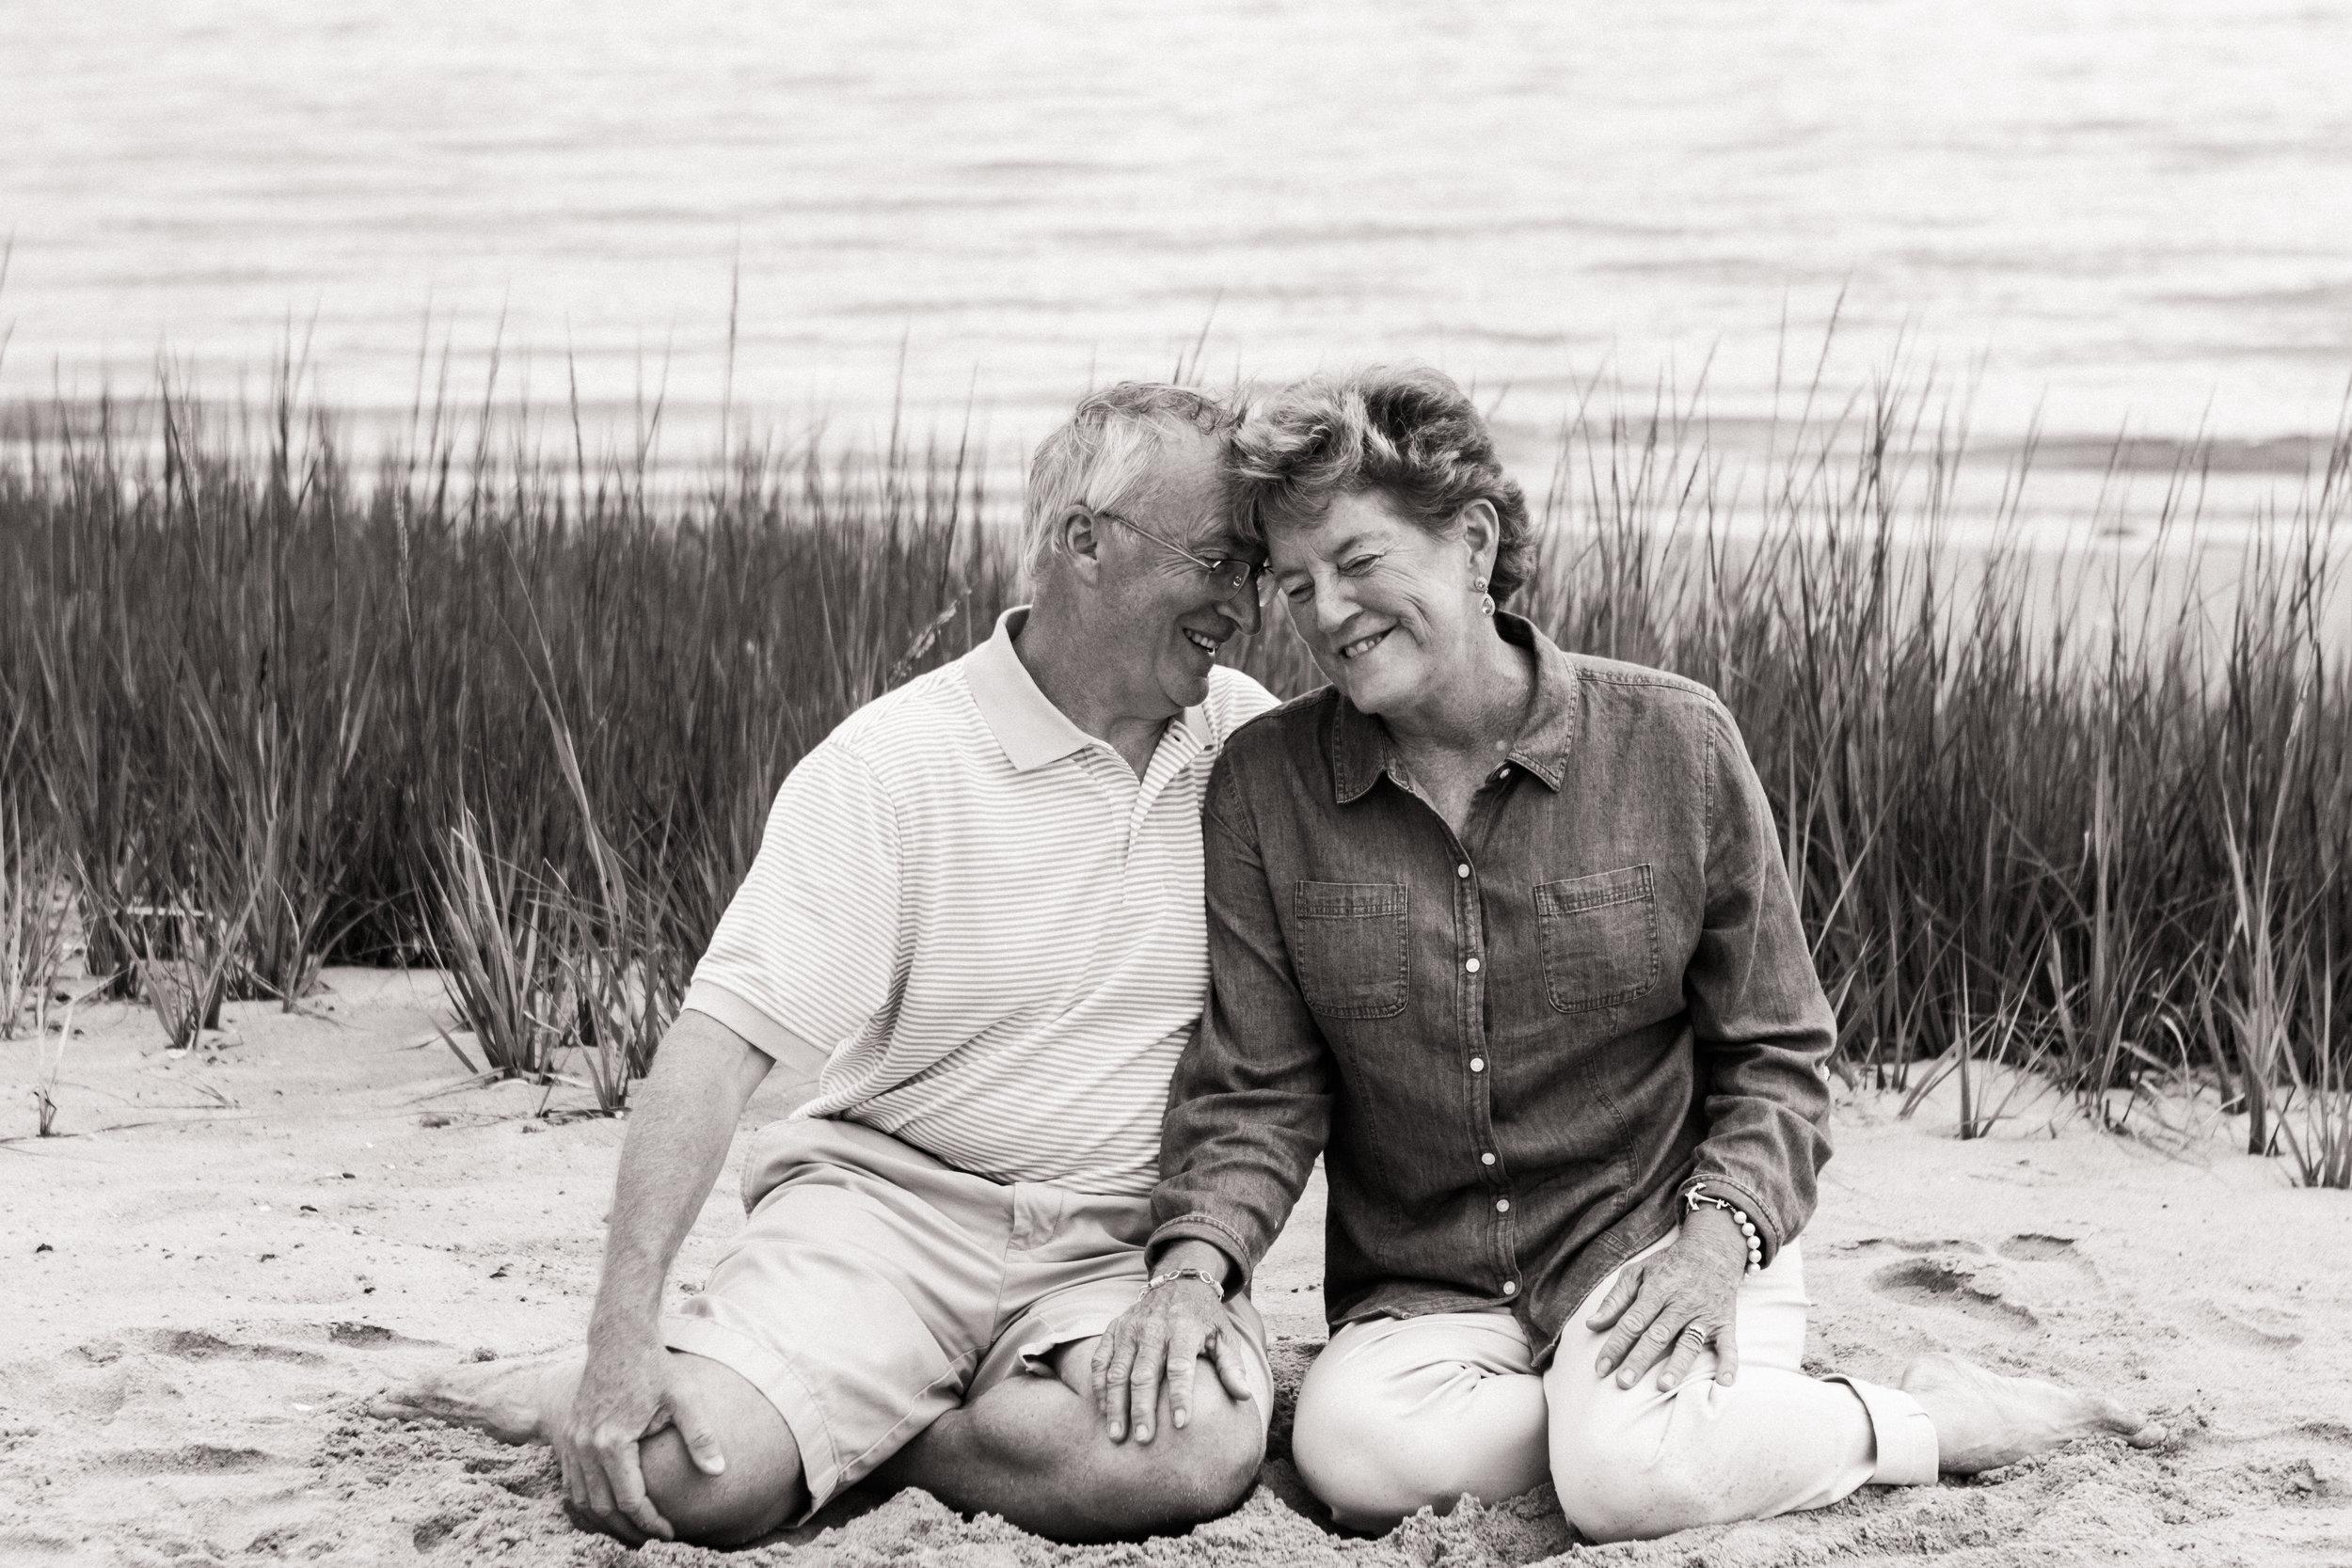 Duxbury Family Photographer, Duxbury Beach, Powder Point Bridge, Duxbury Massachusetts, Scituate Massachusetts, Shannon Sorensen Photography, Connecticut Family Photographer